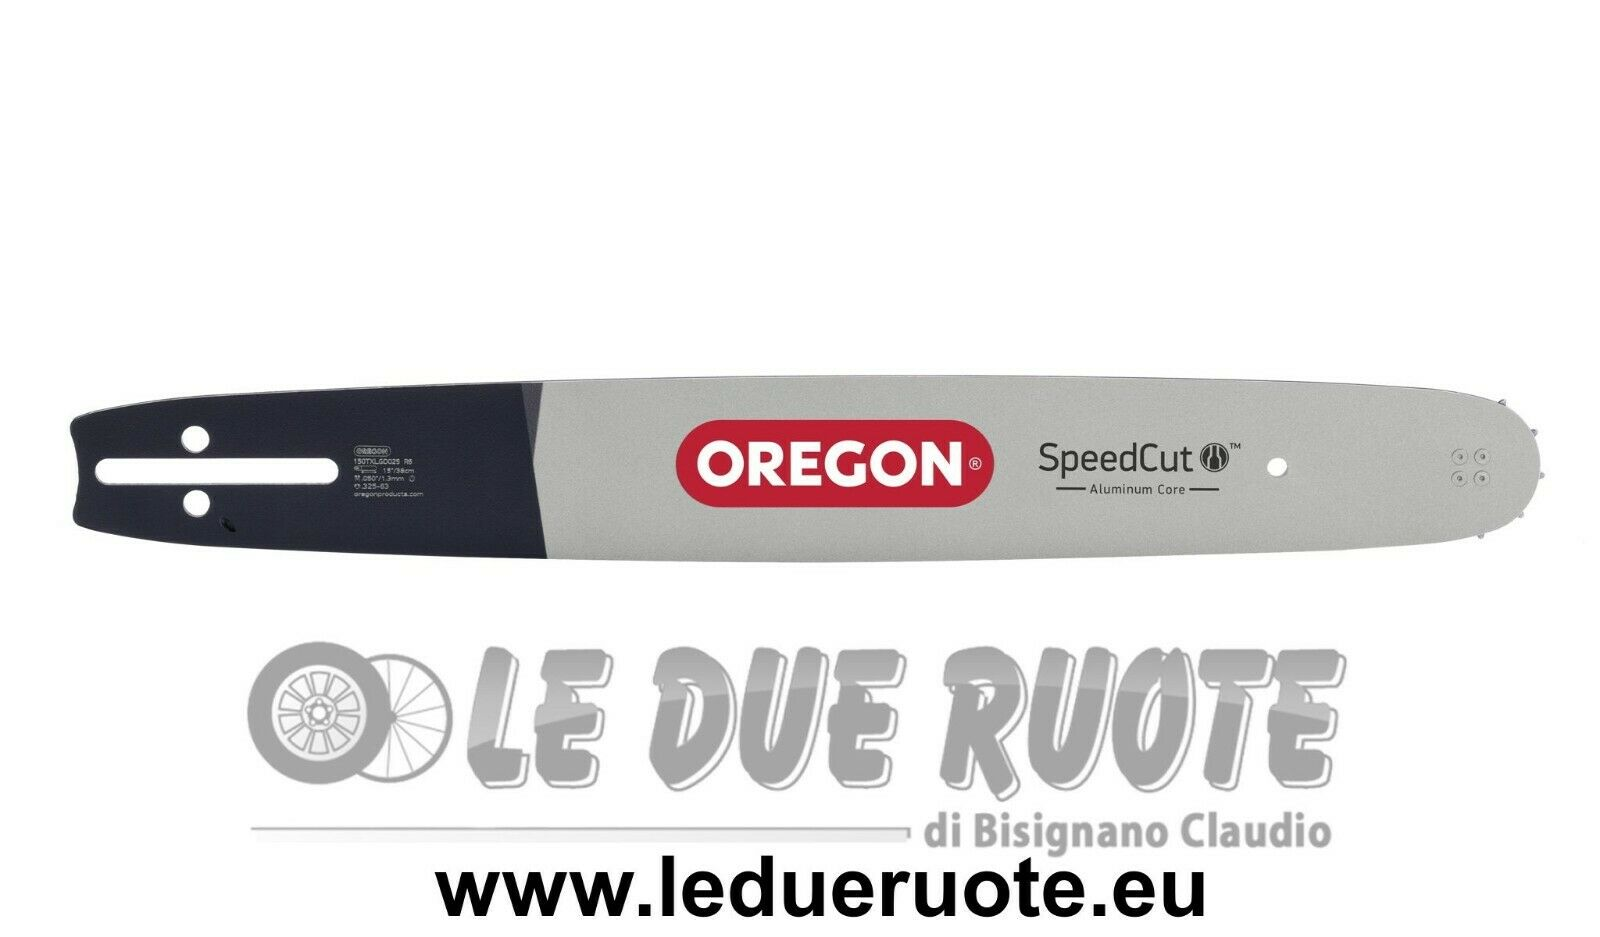 Barra Oregon Motosierra Alpina P470 480 Speed Cut™ 40 45 cm Original